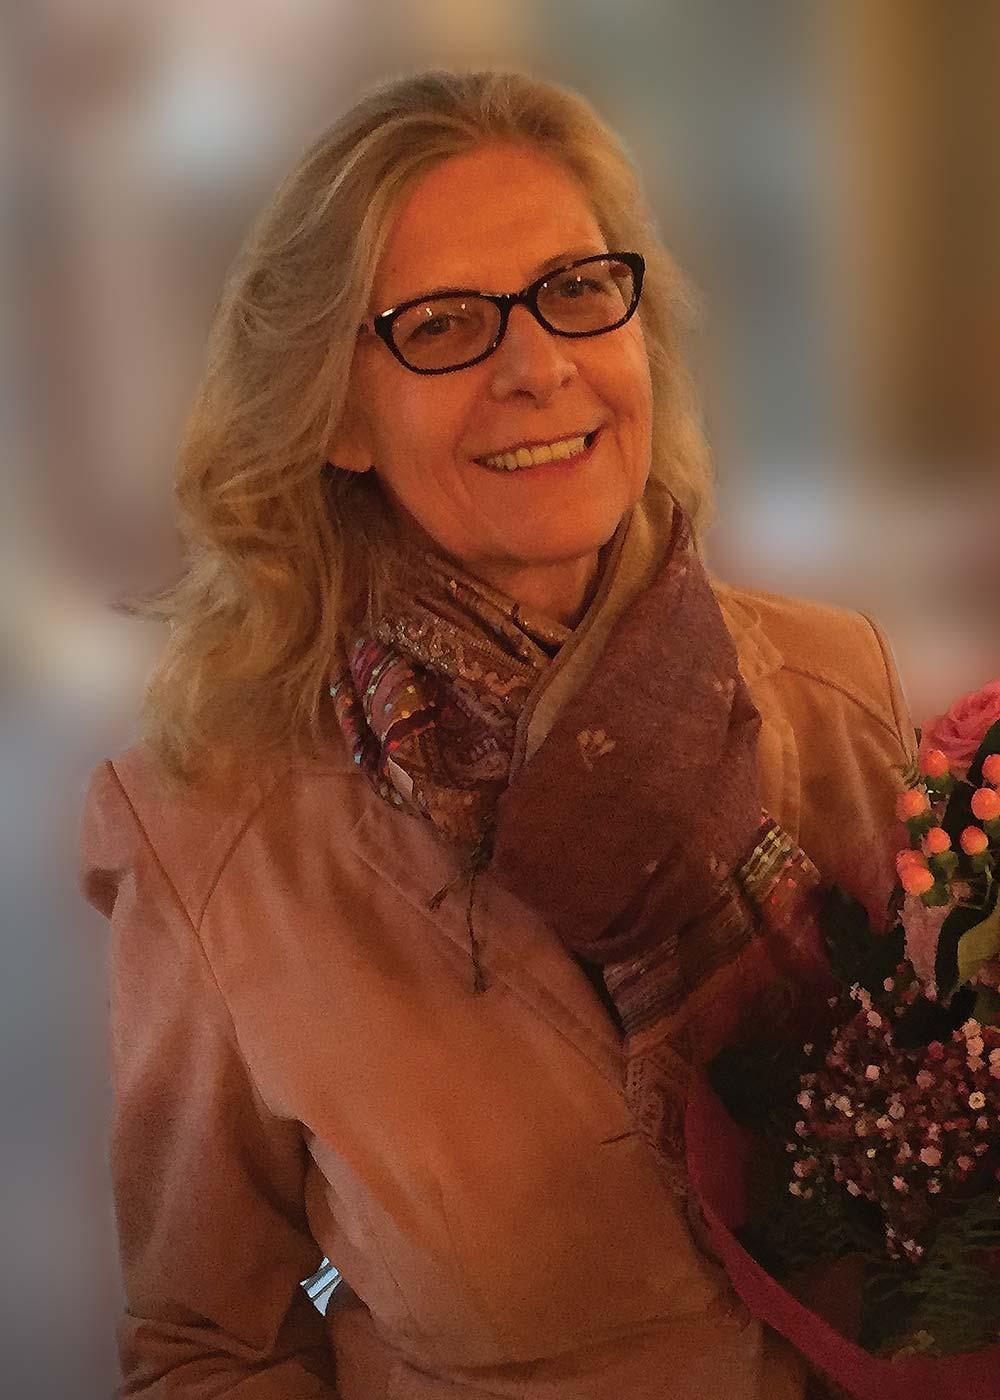 Christine Bögöthy Astrologische Beratung Telfs Tirol Wien Astrologie